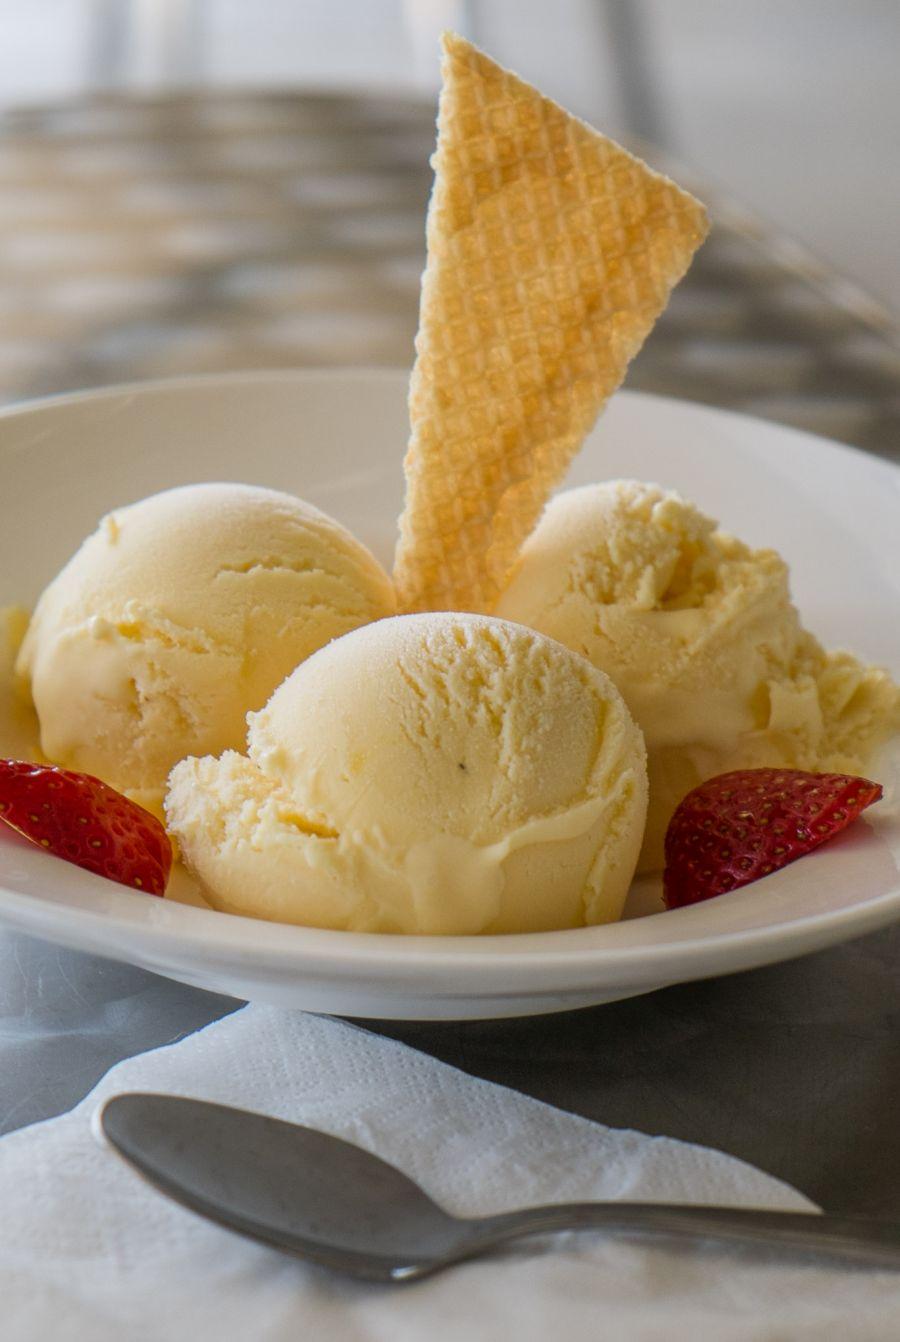 Butterscotch cream and mango ice creams